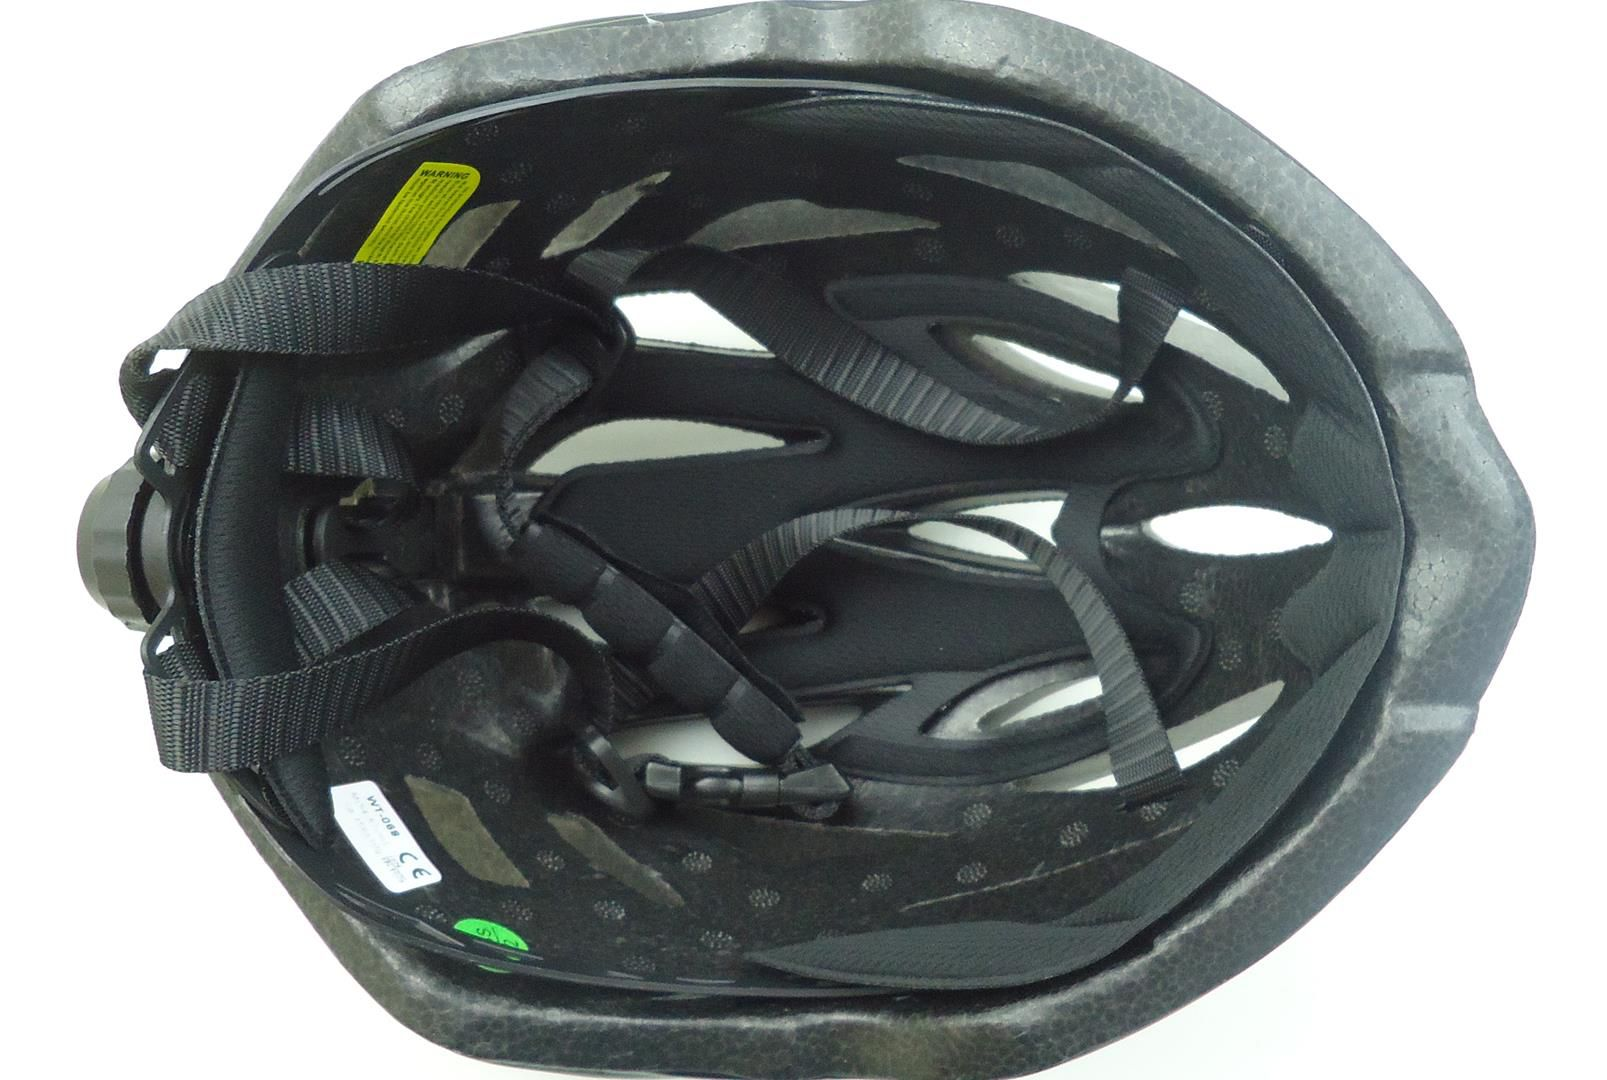 Capacete Bicicleta Argon Dharma Tamanho M 54-57cm Speed ou MTB com Viseira